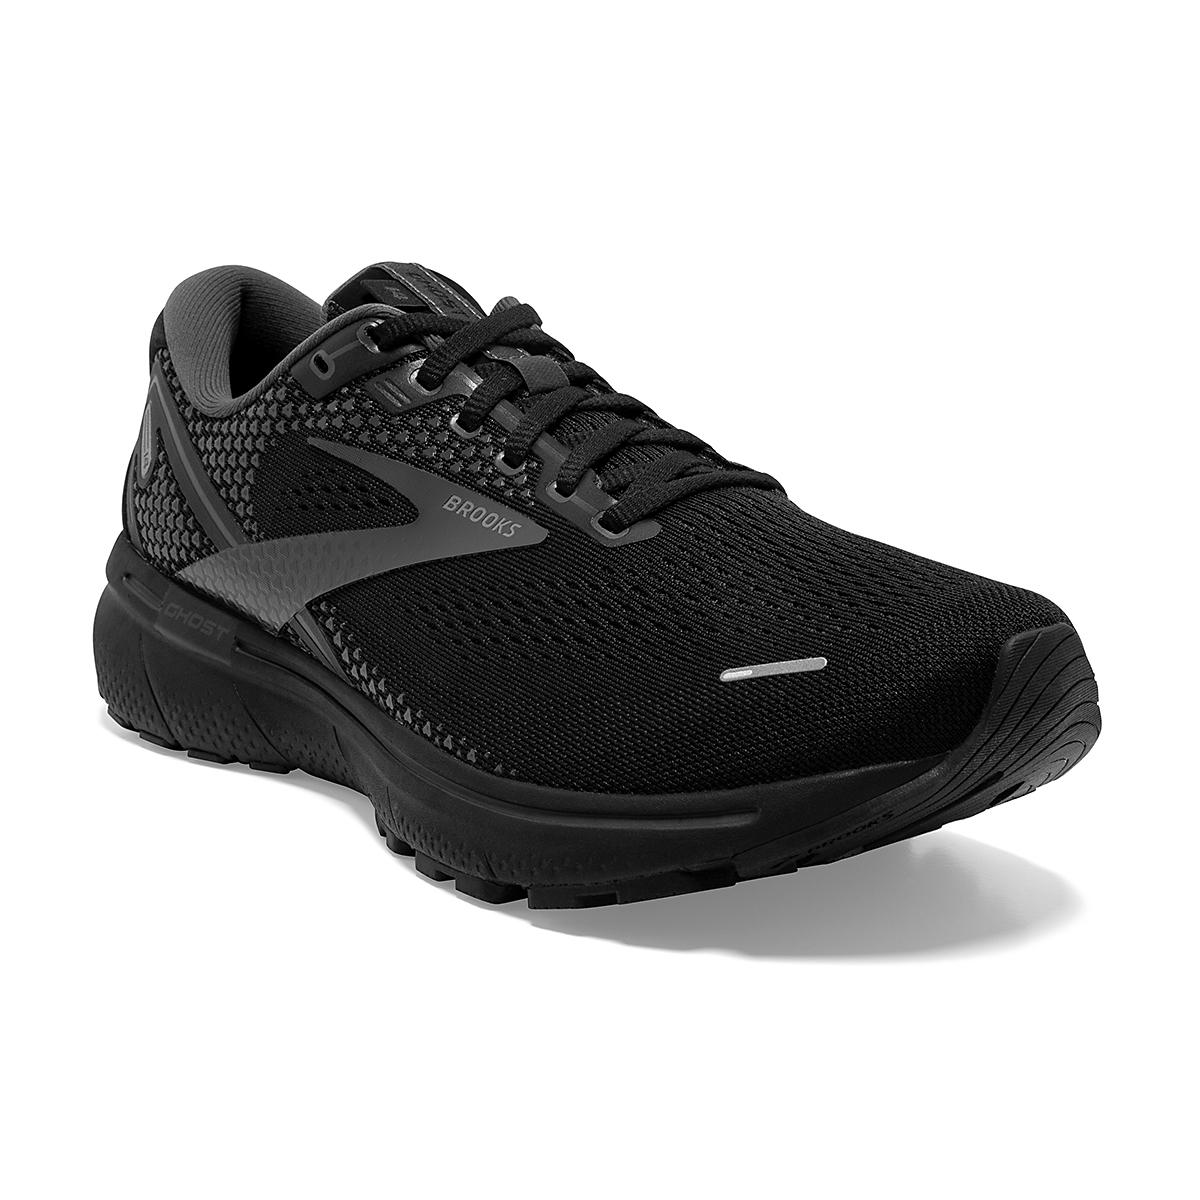 Men's Brooks Ghost 14 Running Shoe - Color: Black/Black/Ebony - Size: 7 - Width: Regular, Black/Black/Ebony, large, image 5